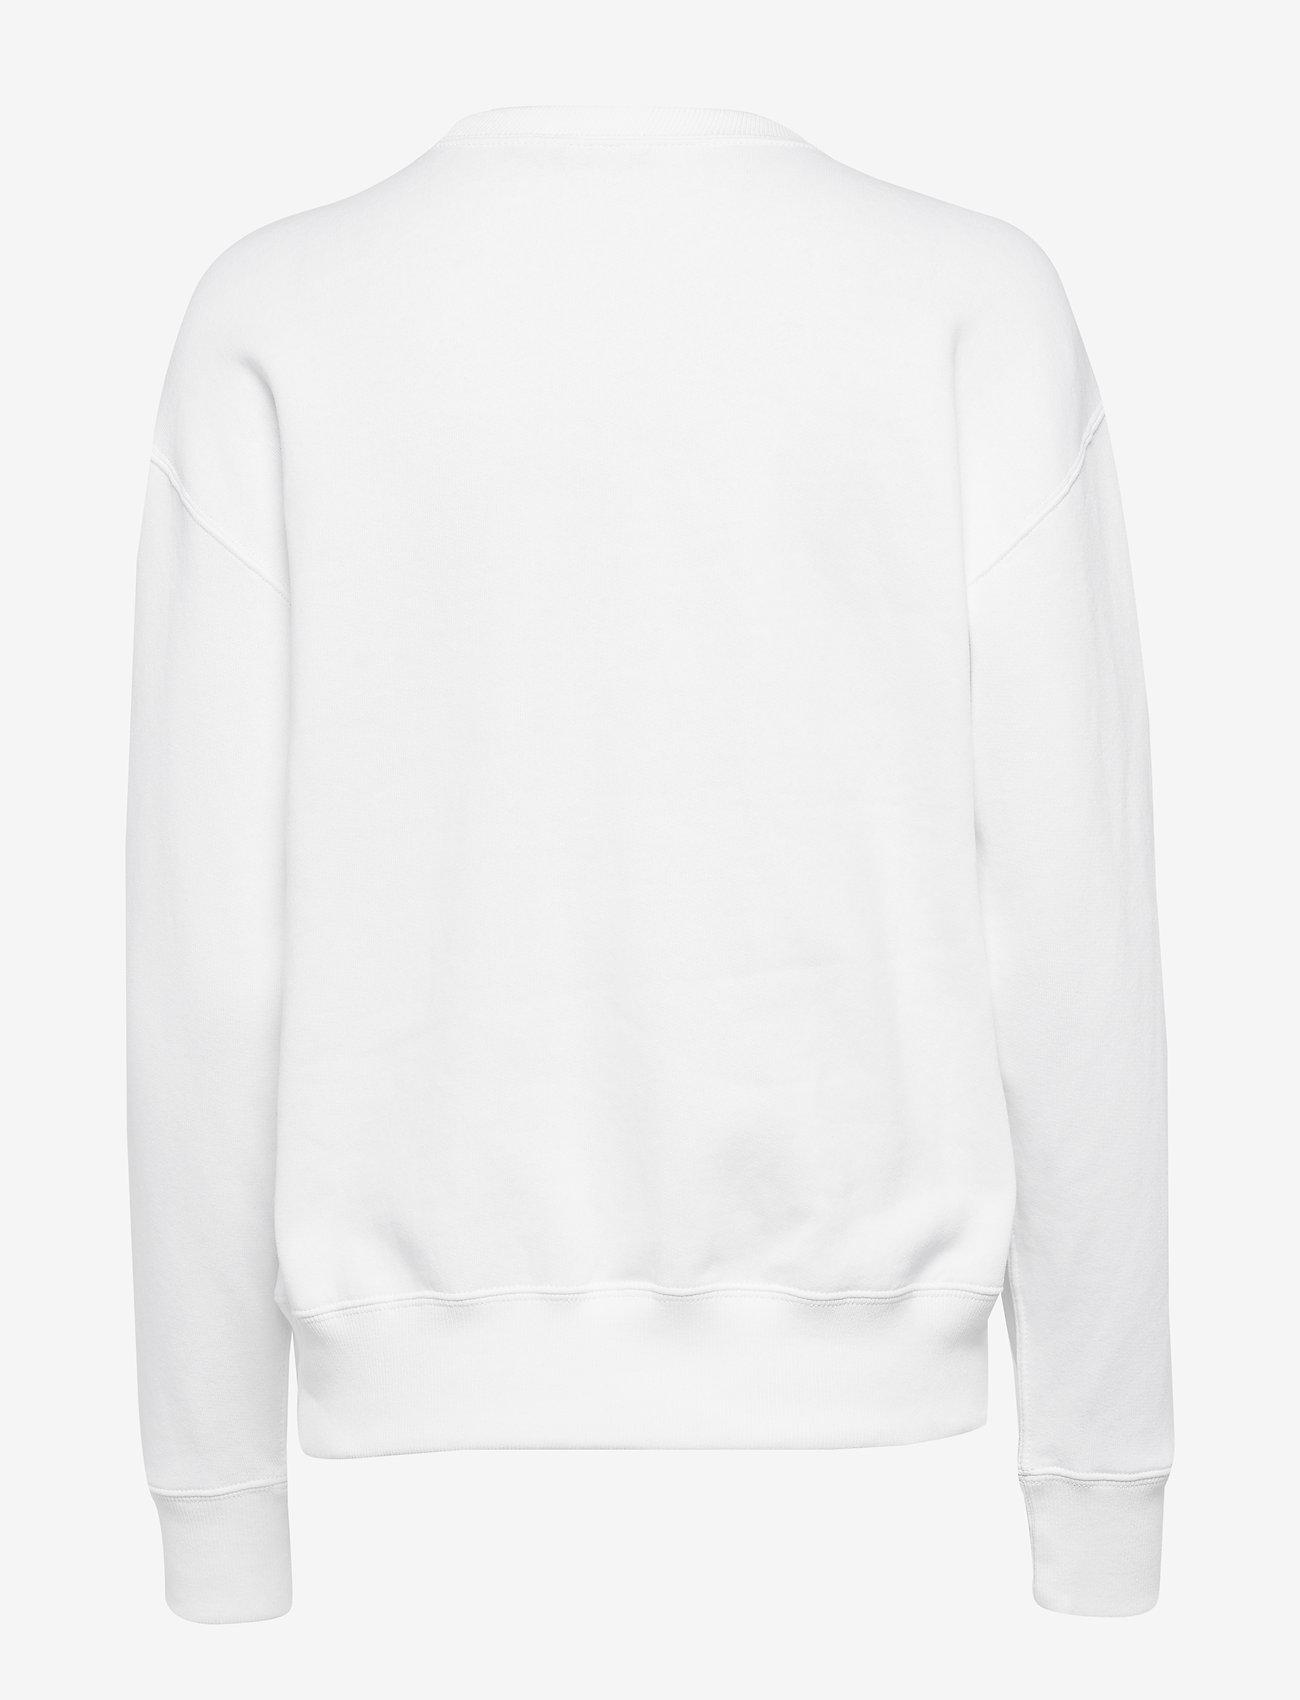 Fleece Pullover (White) - Polo Ralph Lauren RfvmQS